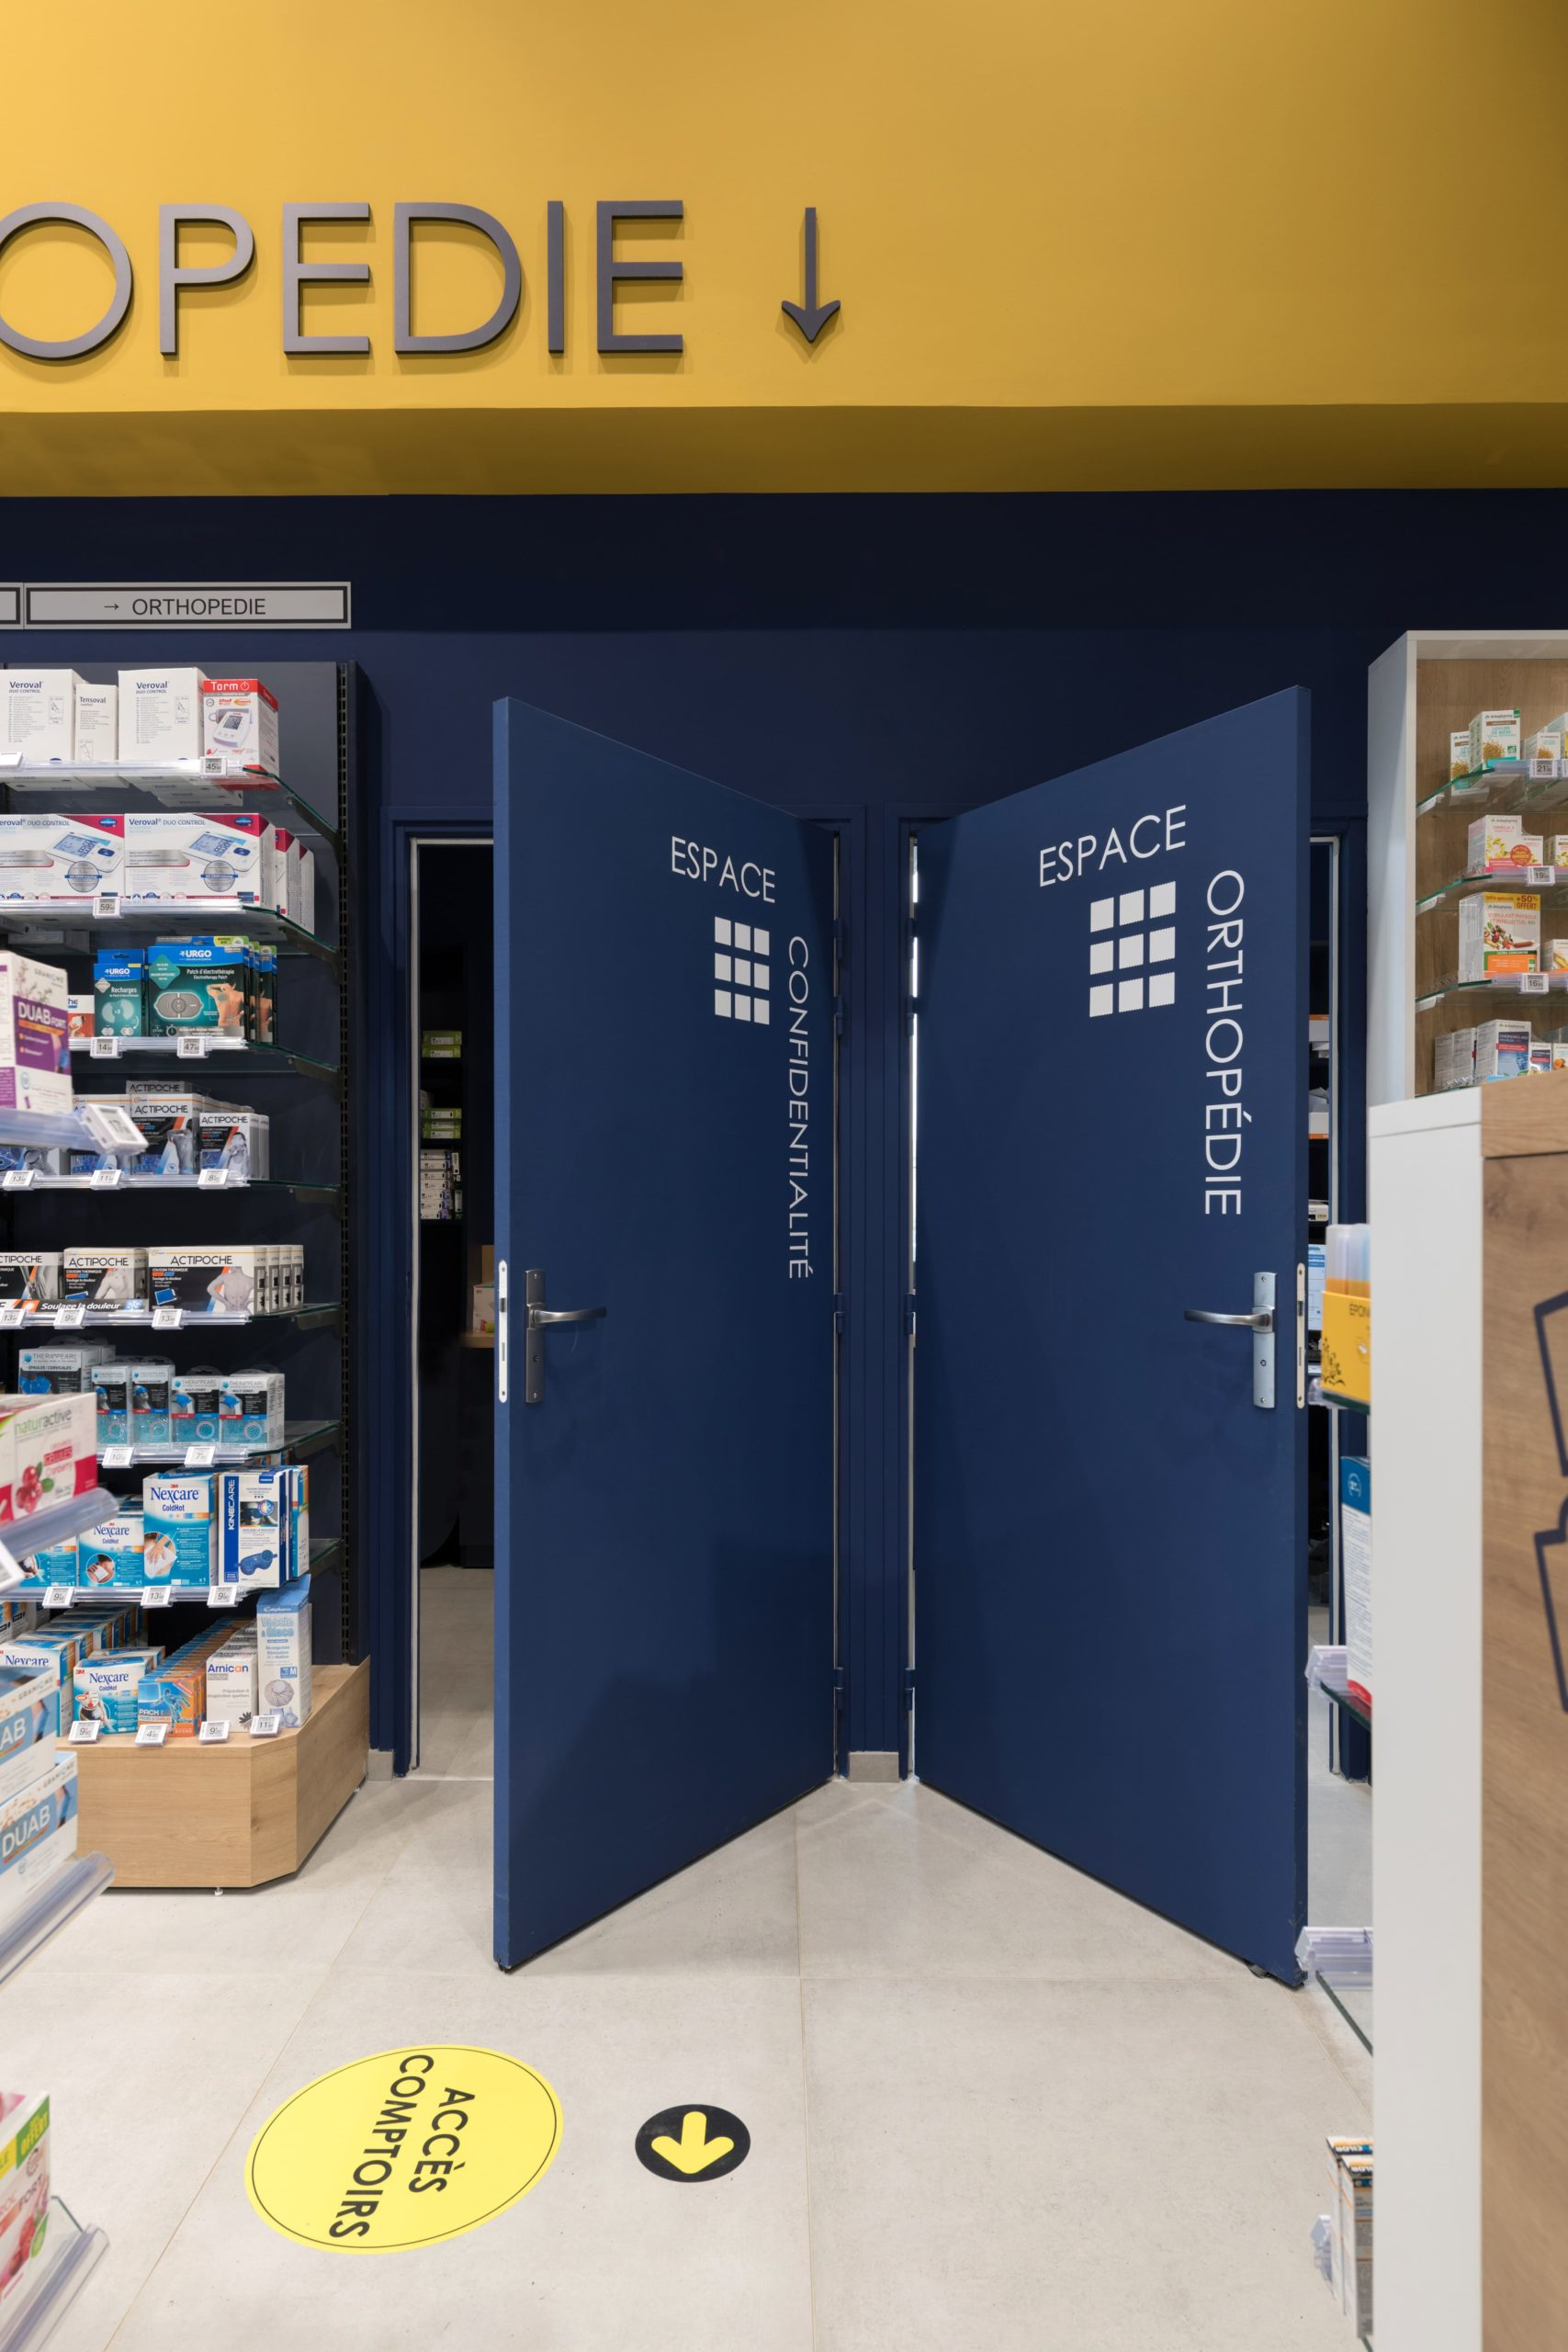 Pharmacie-Gagnaire-Issoire-Cubik-Agenceur-74